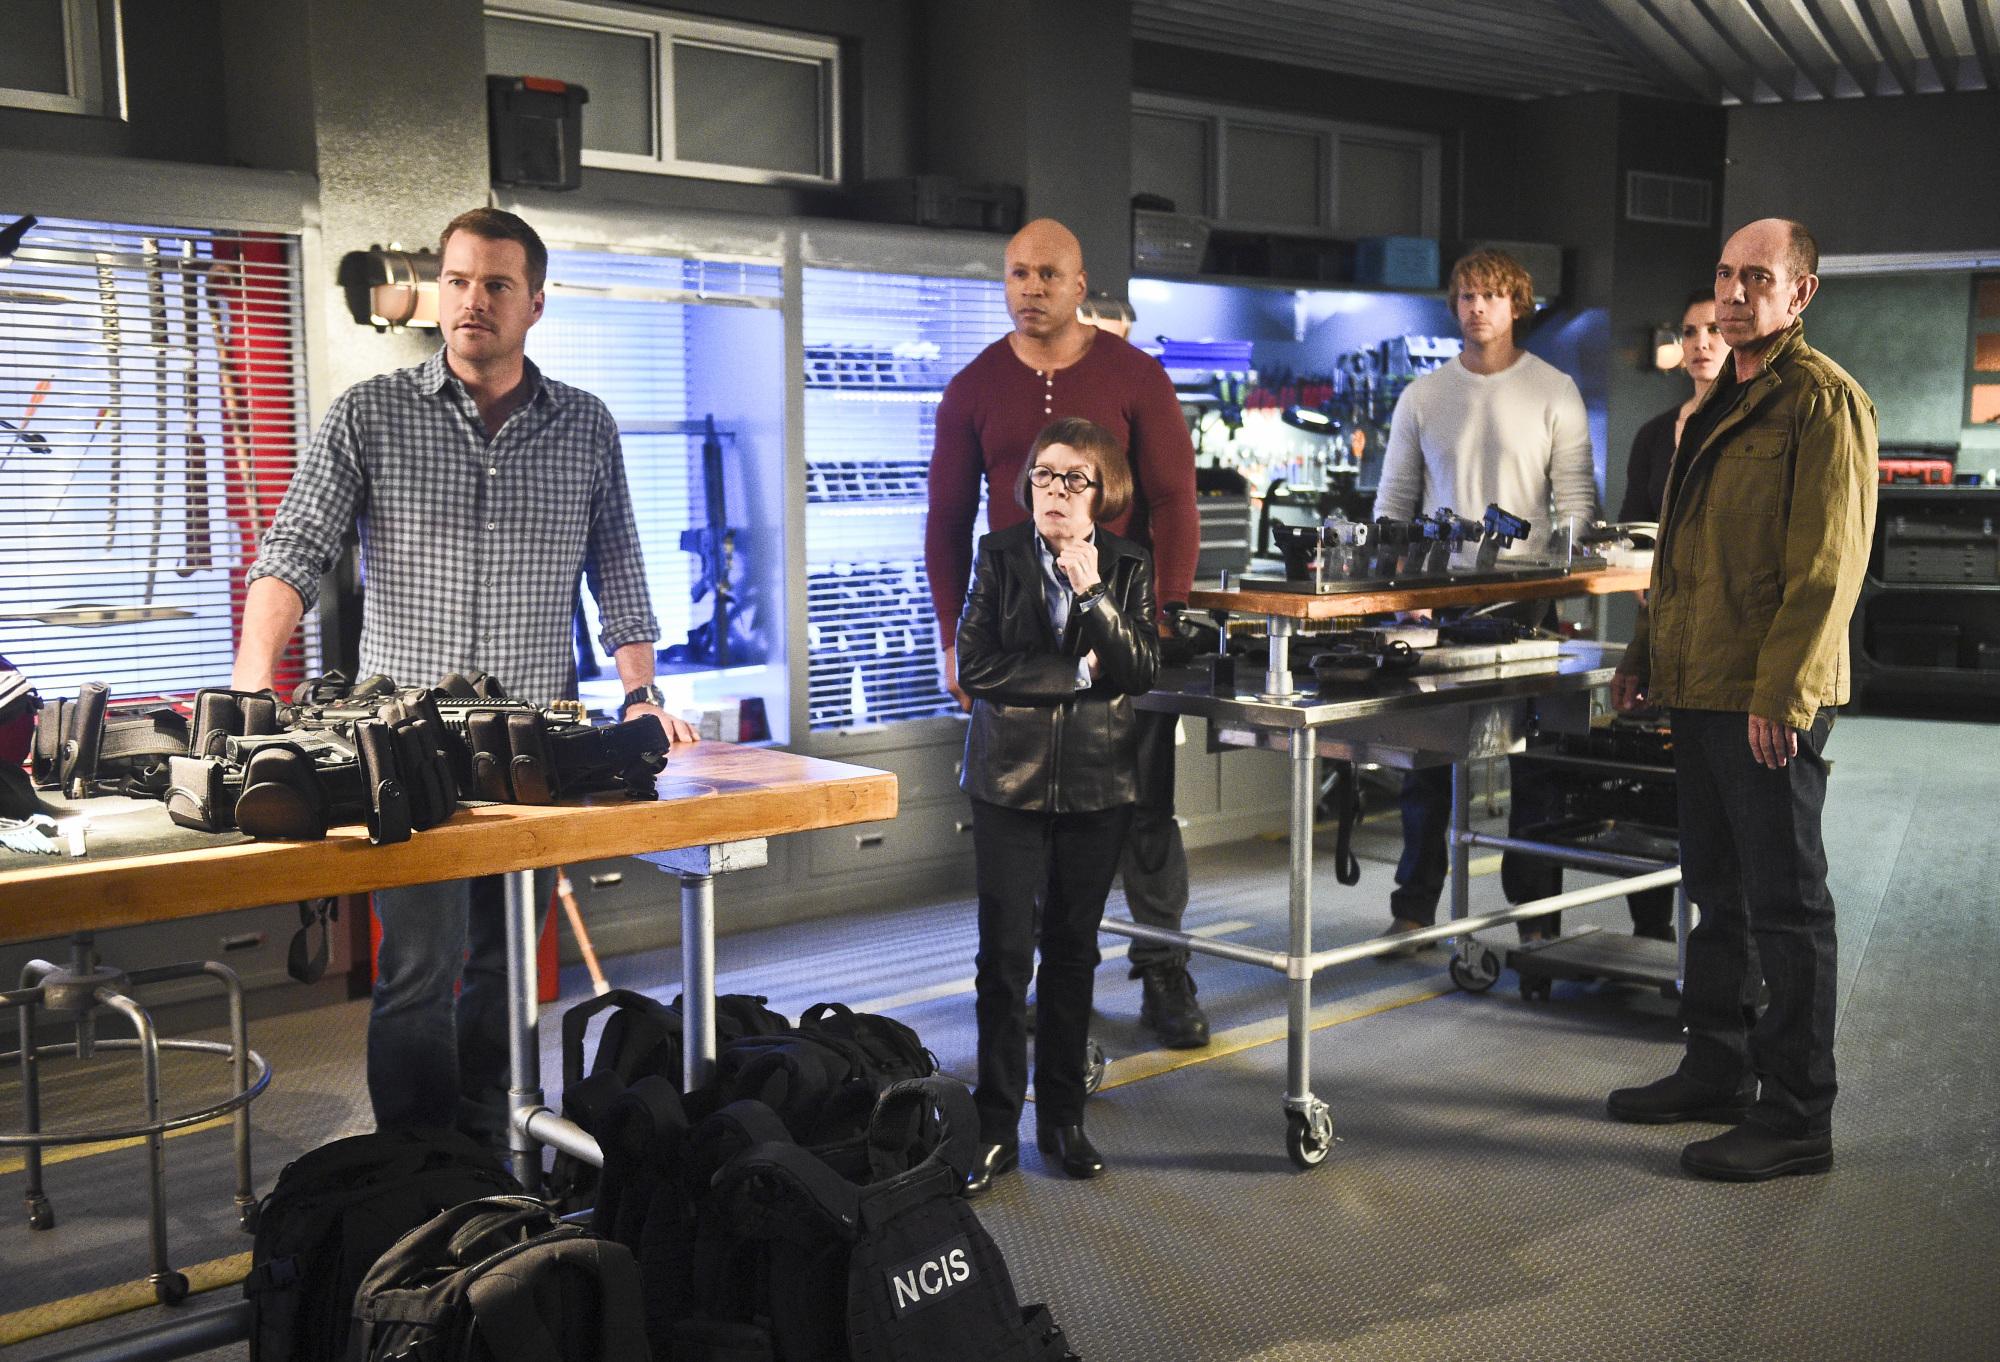 Chris O'Donnell as Special Agent G. Callen, LL COOL J as Special Agent Sam Hanna, Linda Hunt as Henrietta